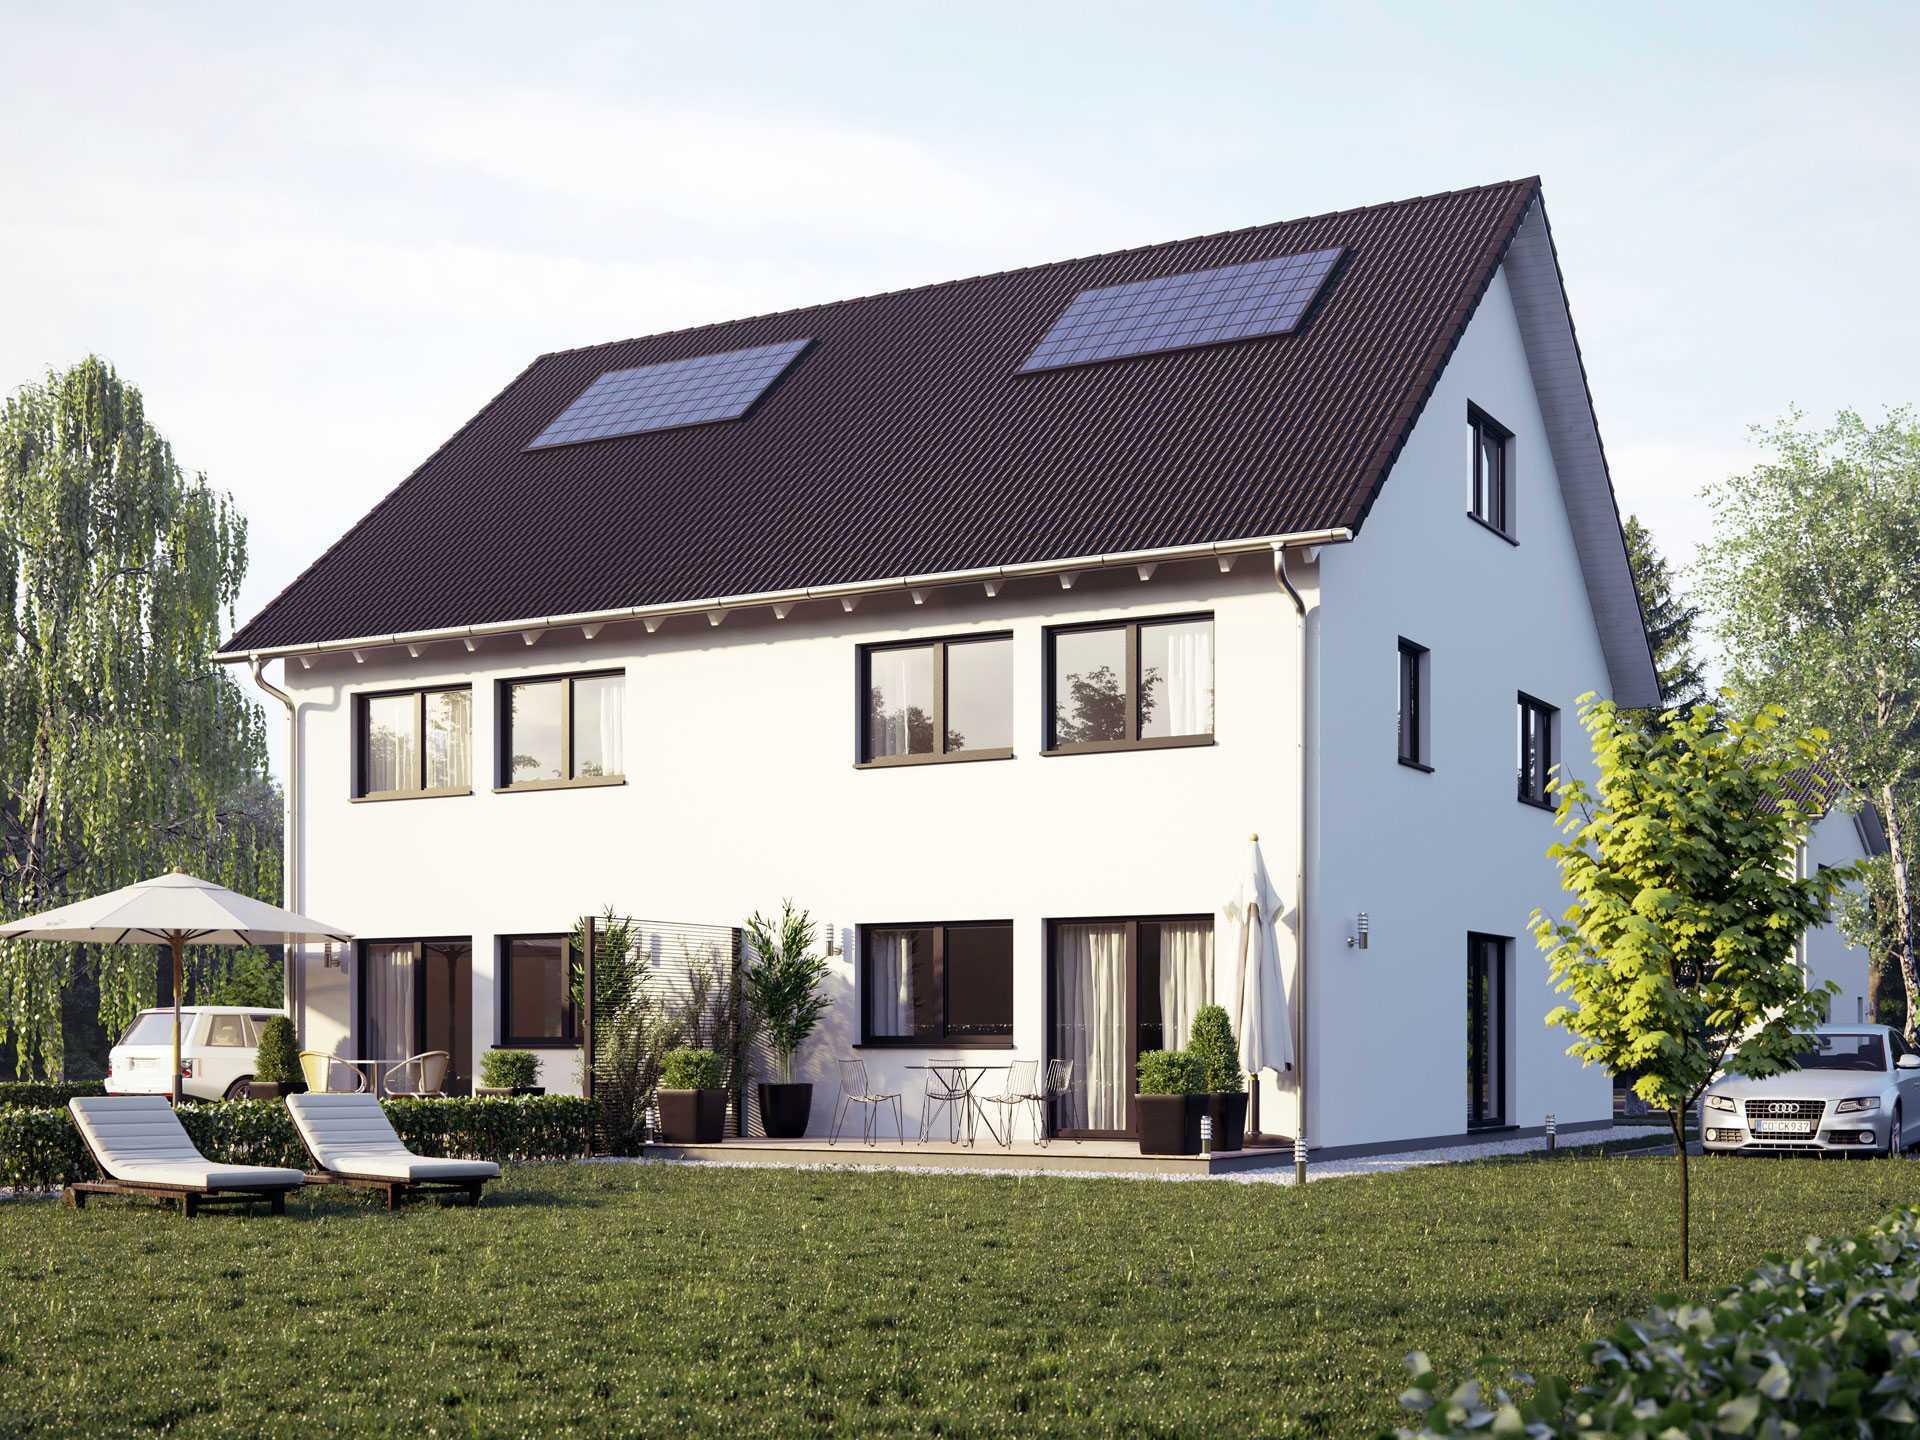 Doppelhaus Unikat 107 Talbau Haus Musterhausnet